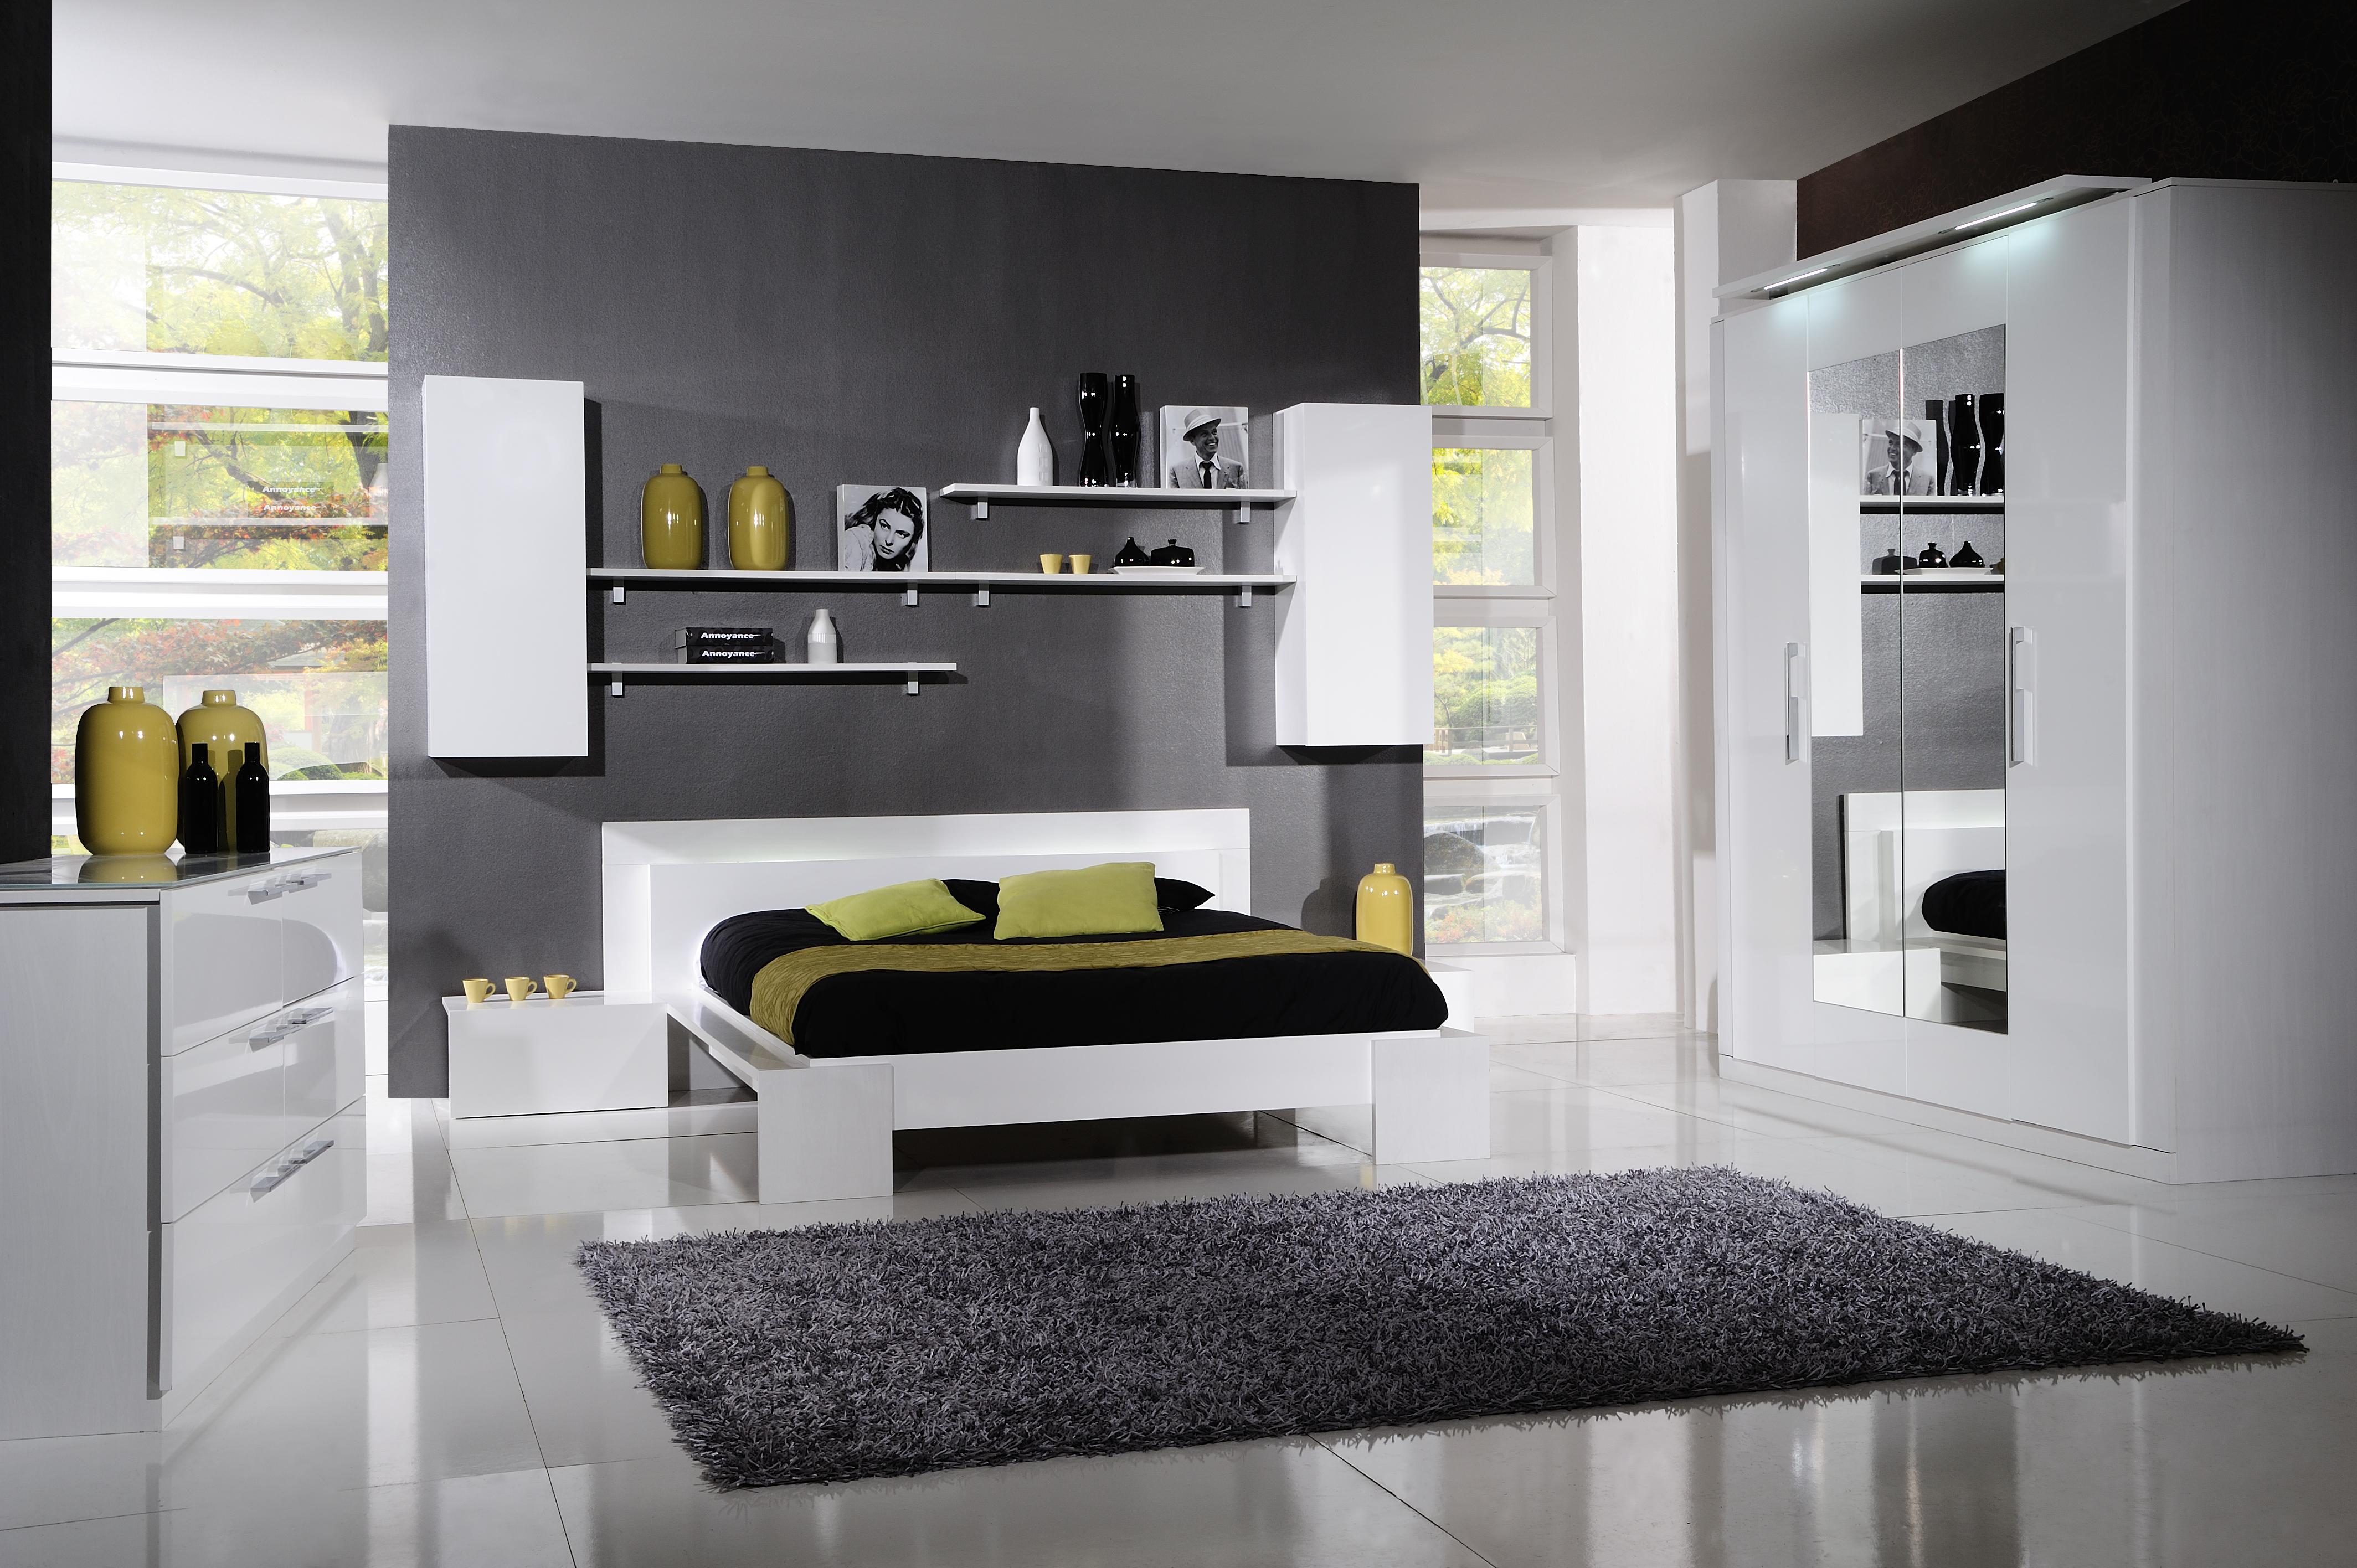 Amazing Modern Bedroom Furniture Product 4256 x 2832 · 6018 kB · jpeg